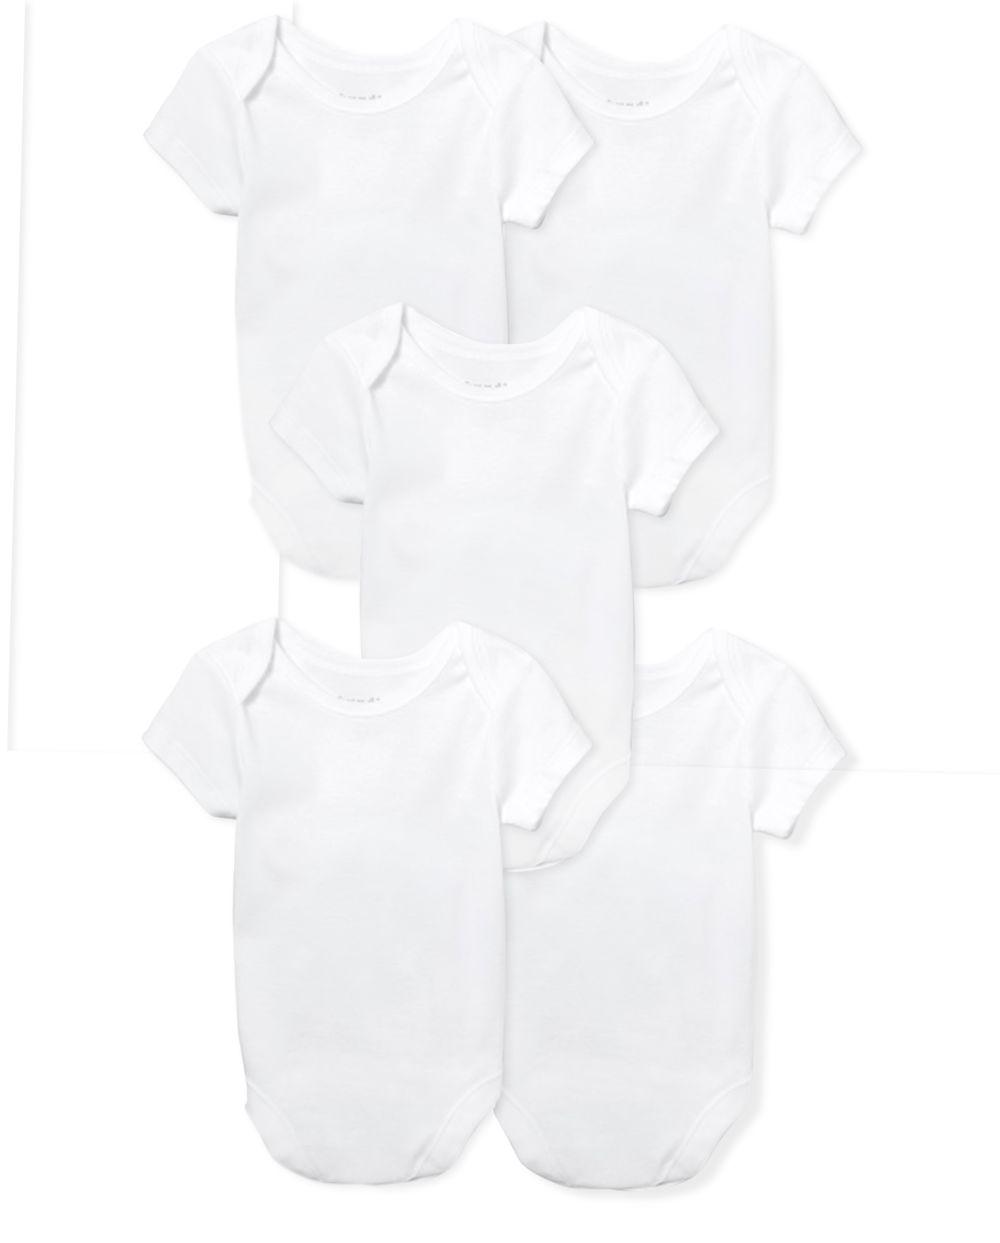 Unisex Baby Bodysuit 5-Pack